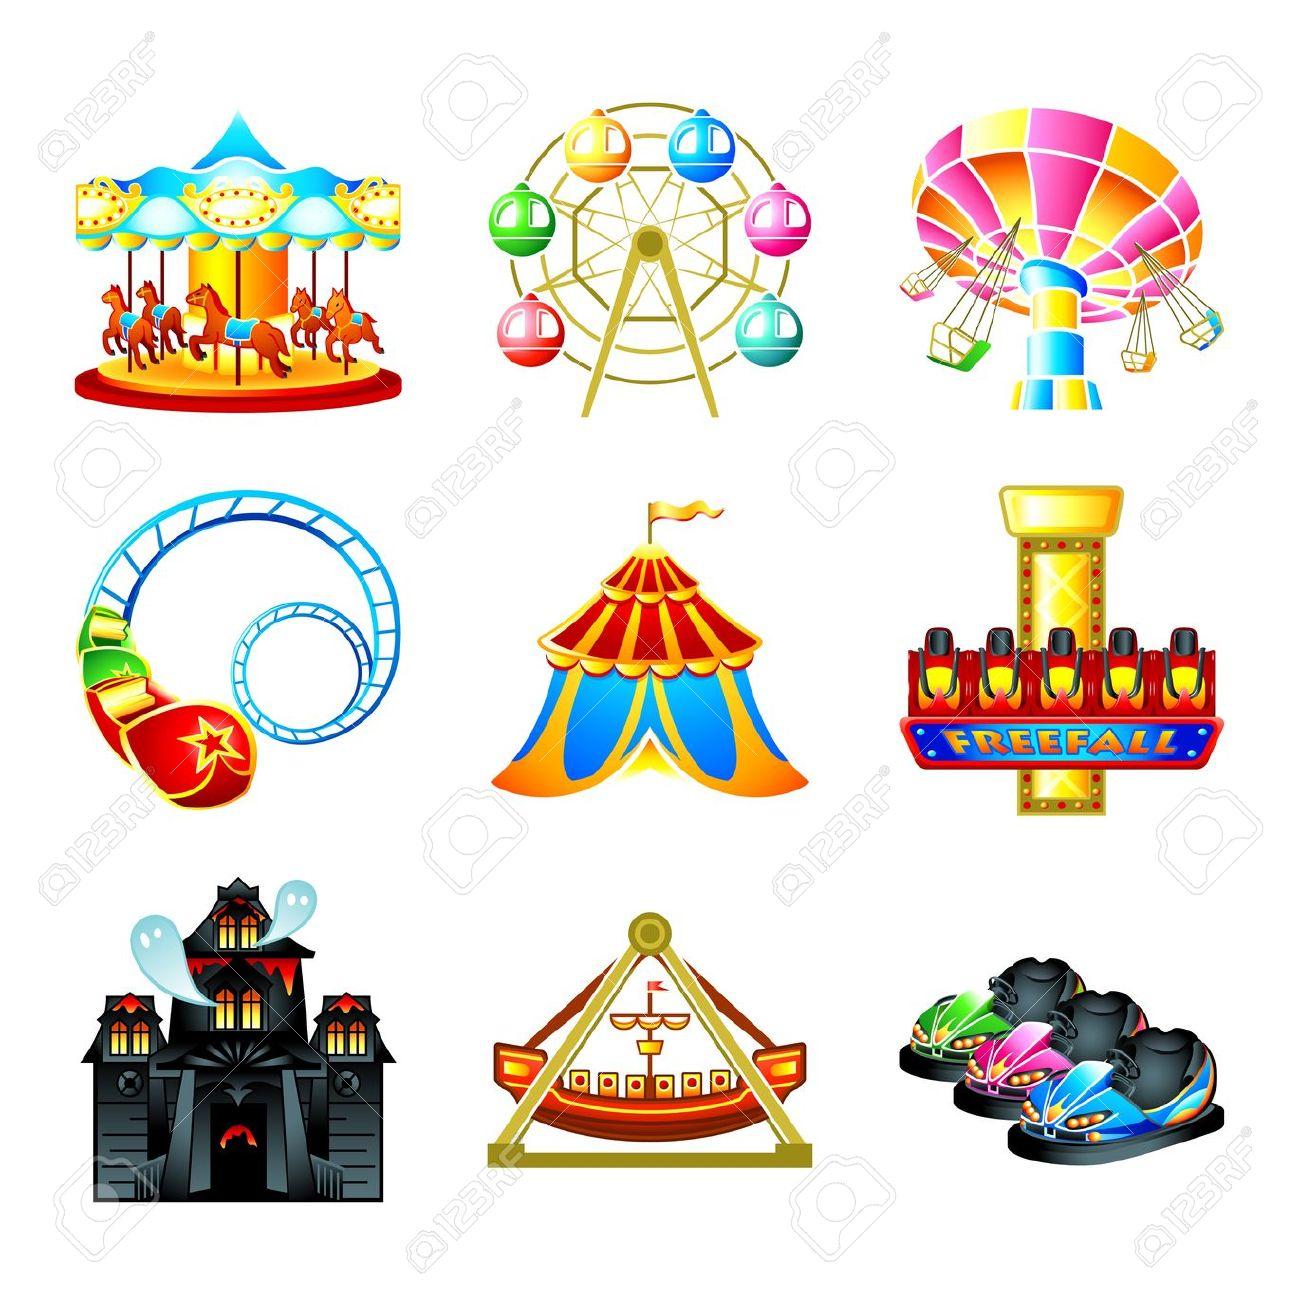 Theme Park Rides Clipart-Theme Park Rides Clipart-16